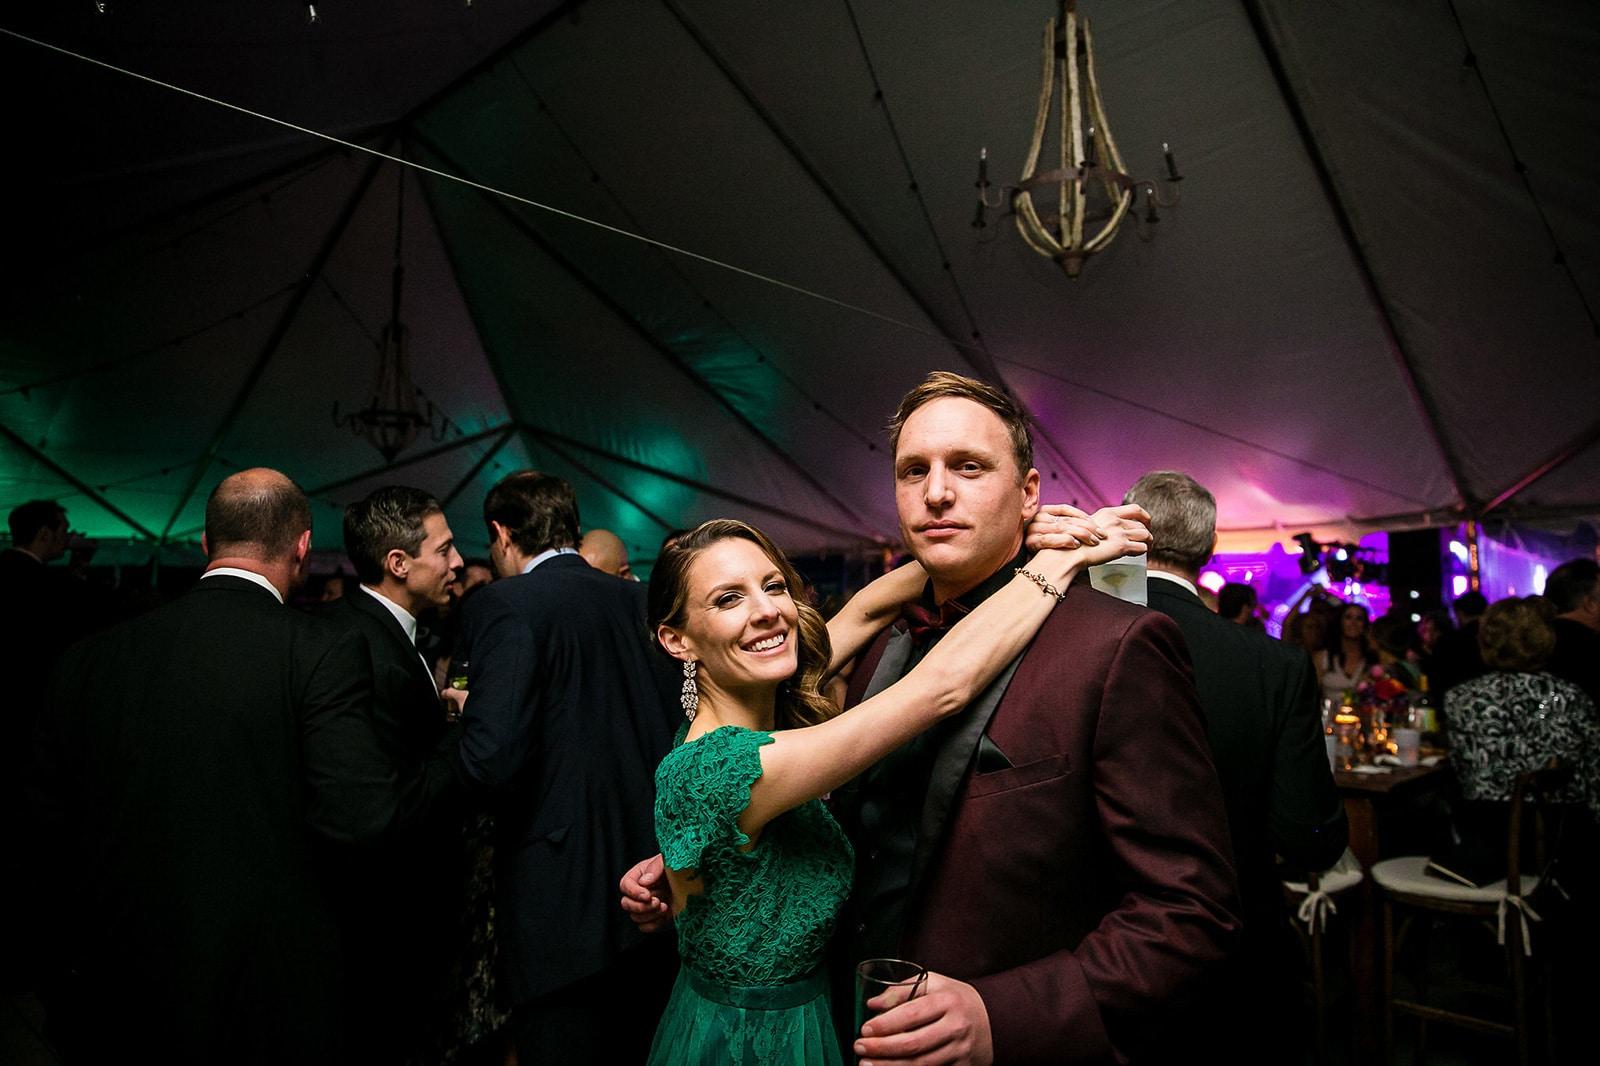 Couple enjoying the Green Gala